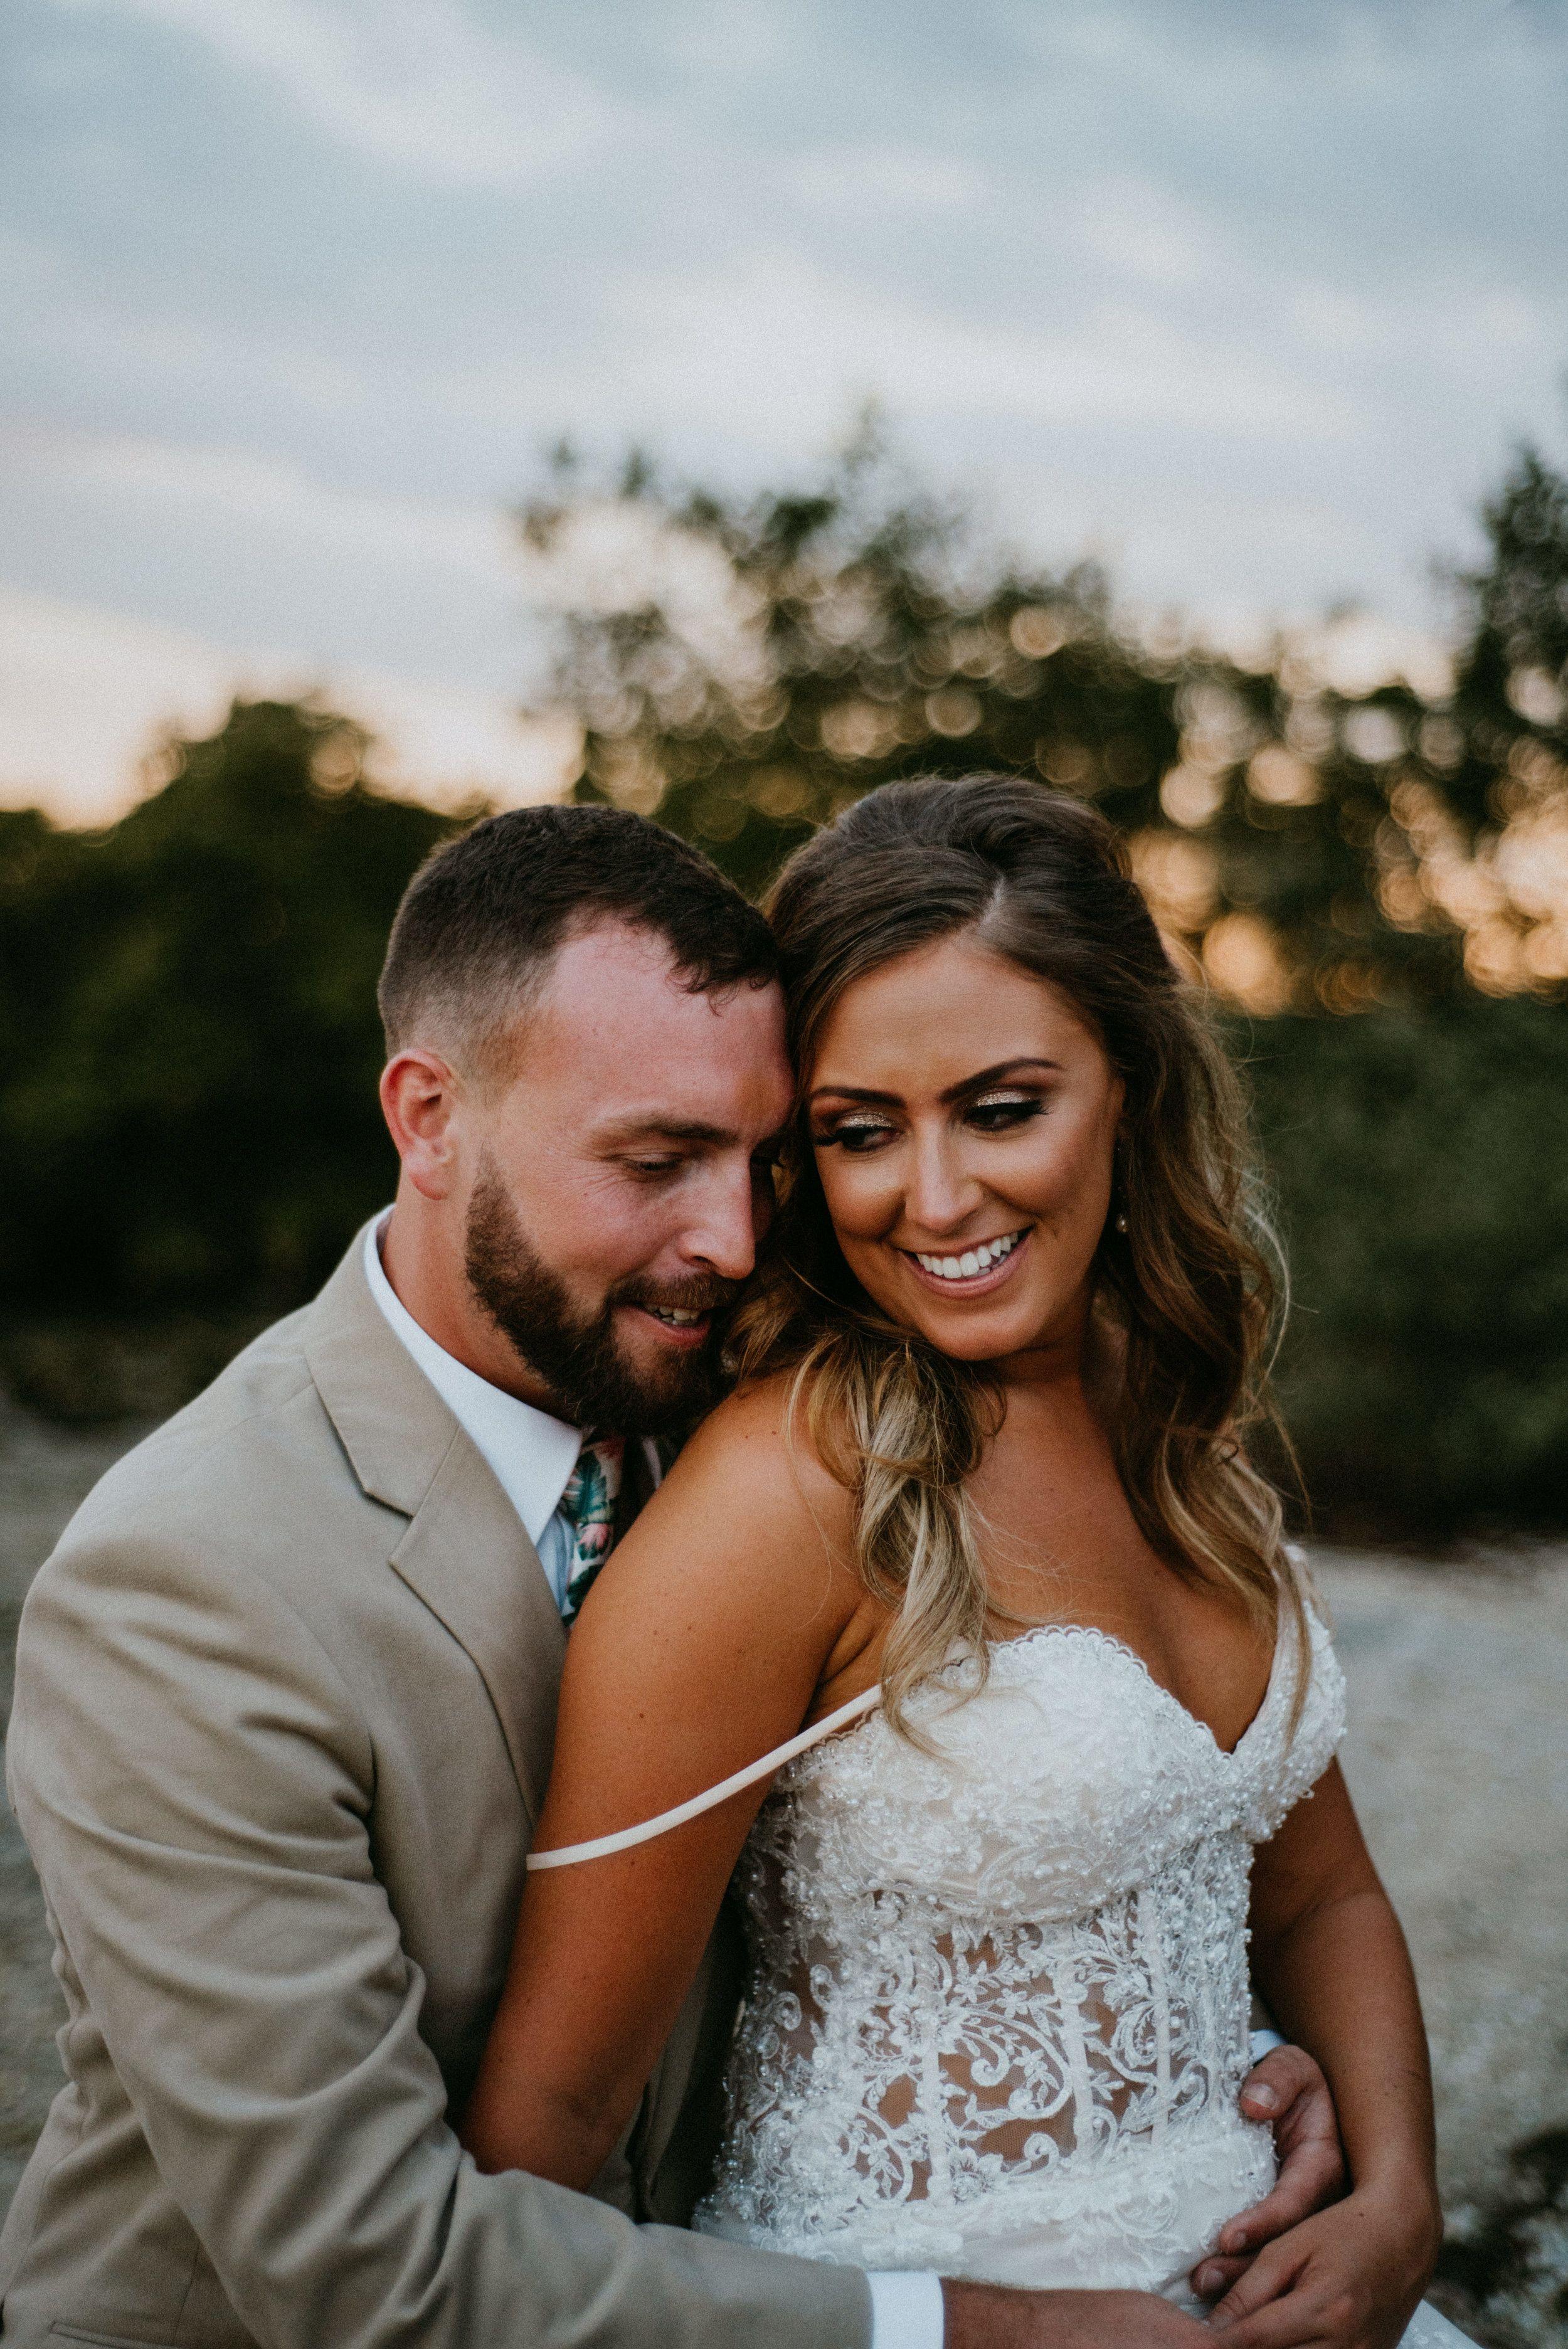 Florida Wedding Photographer Florida Wedding Photography Florida Wedding Photos Orl Florida Wedding Photographer Orlando Wedding Photography Florida Wedding